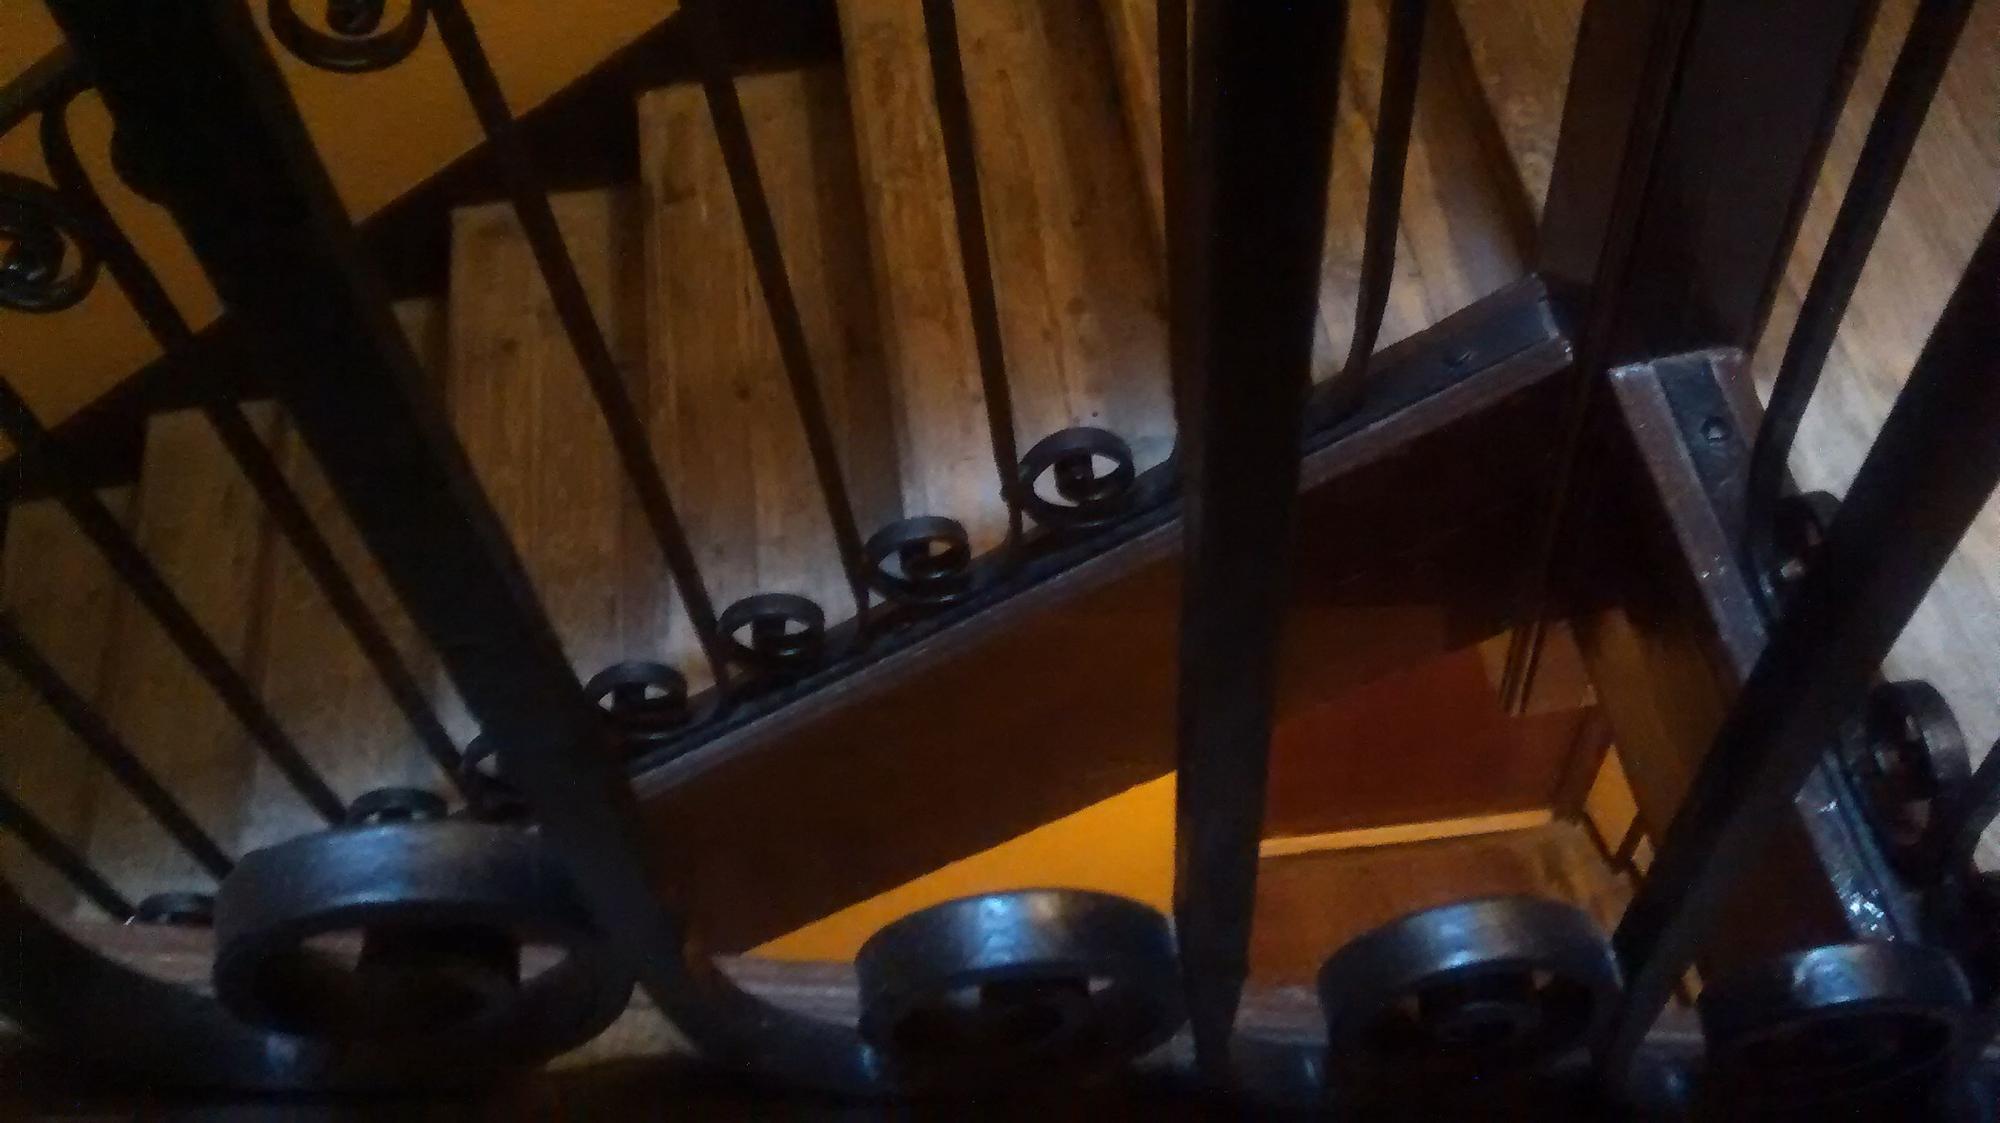 Una escalera de un edificio de viviendas de Malasaña | SOMOS MALASAÑA